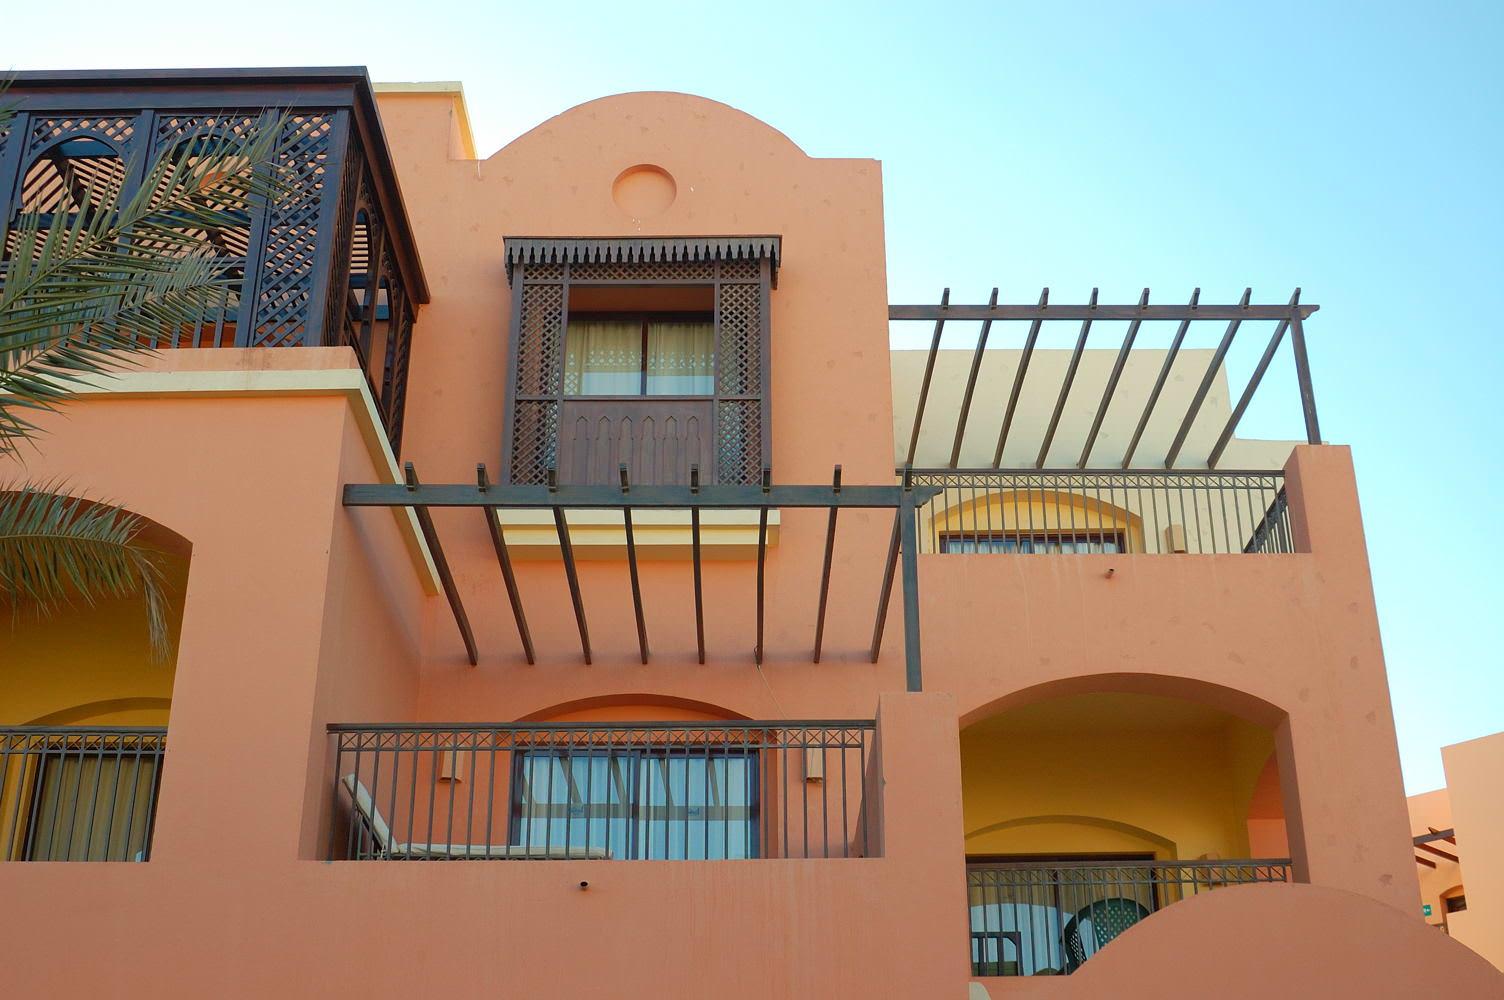 adobe hotel in Egypt